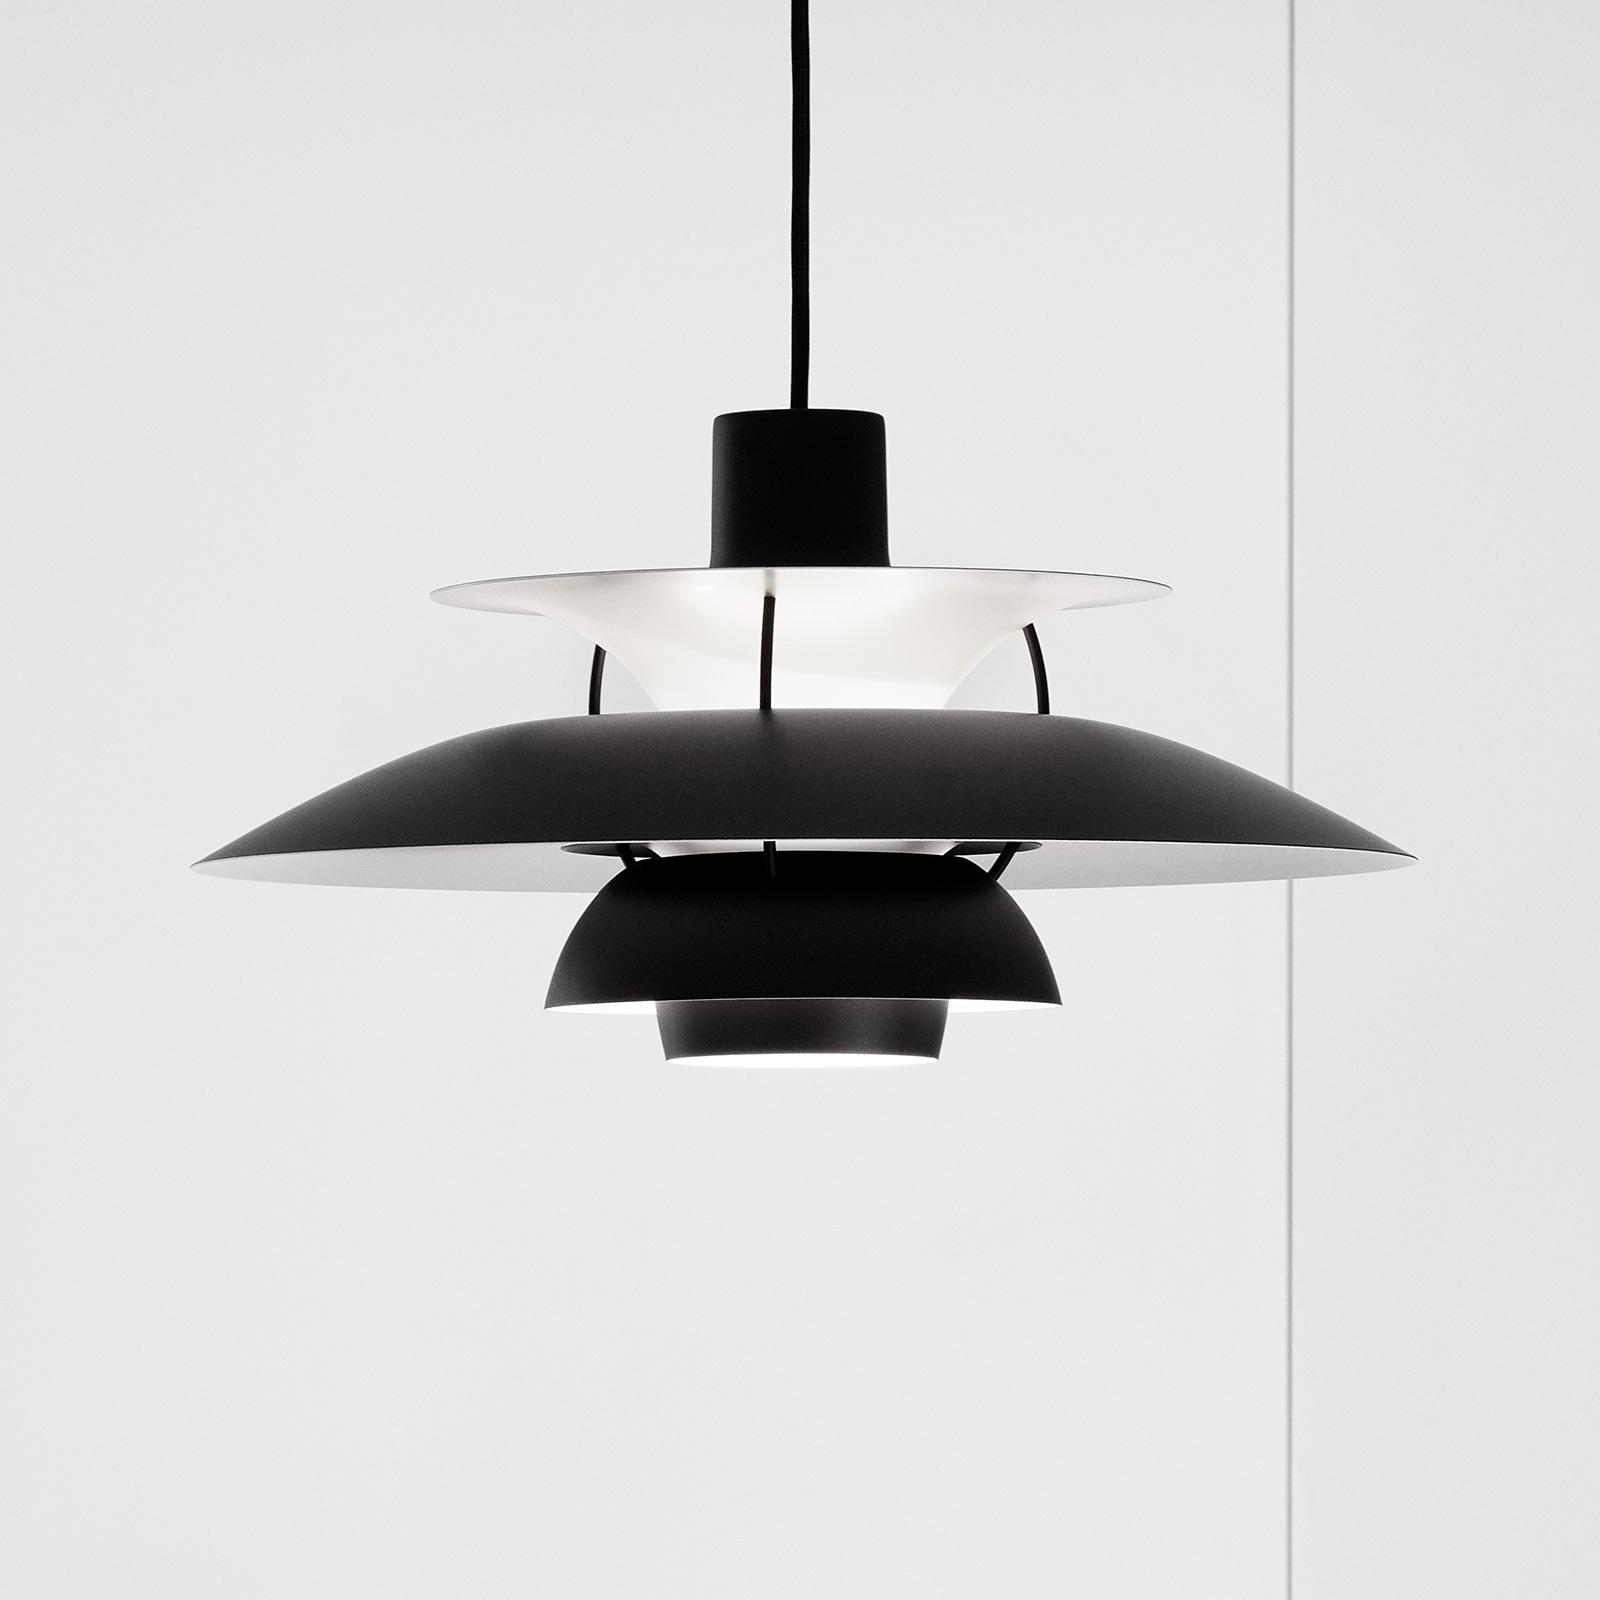 Louis Poulsen PH 5 hanglamp monochroom zwart